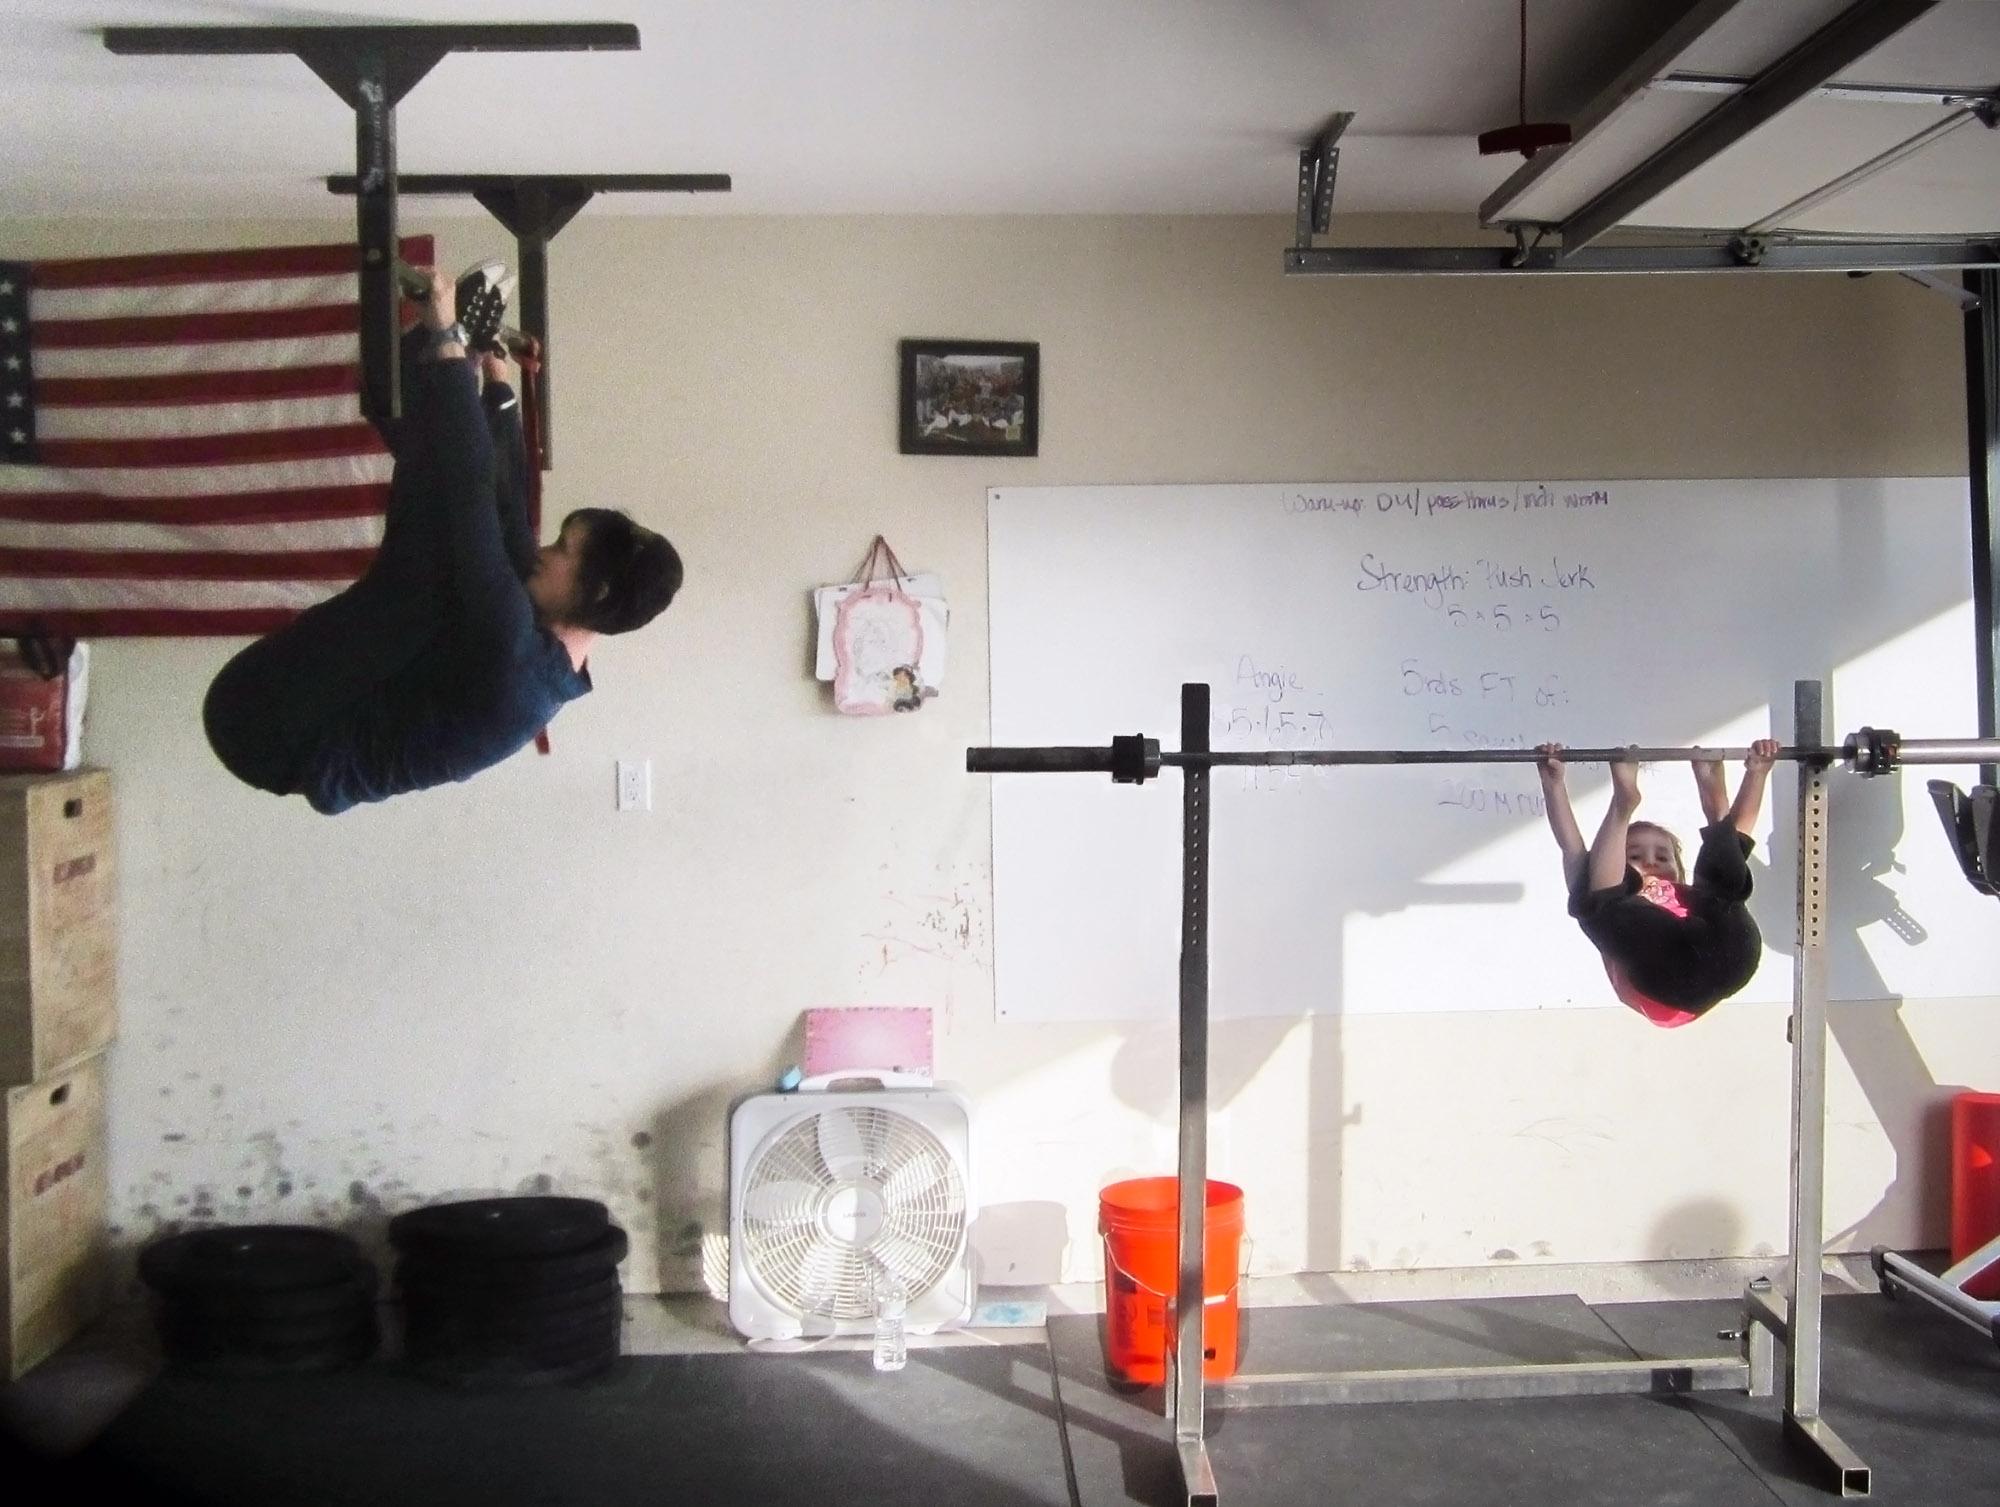 CrossFit: Forging Elite Fitness: Wednesday 111123